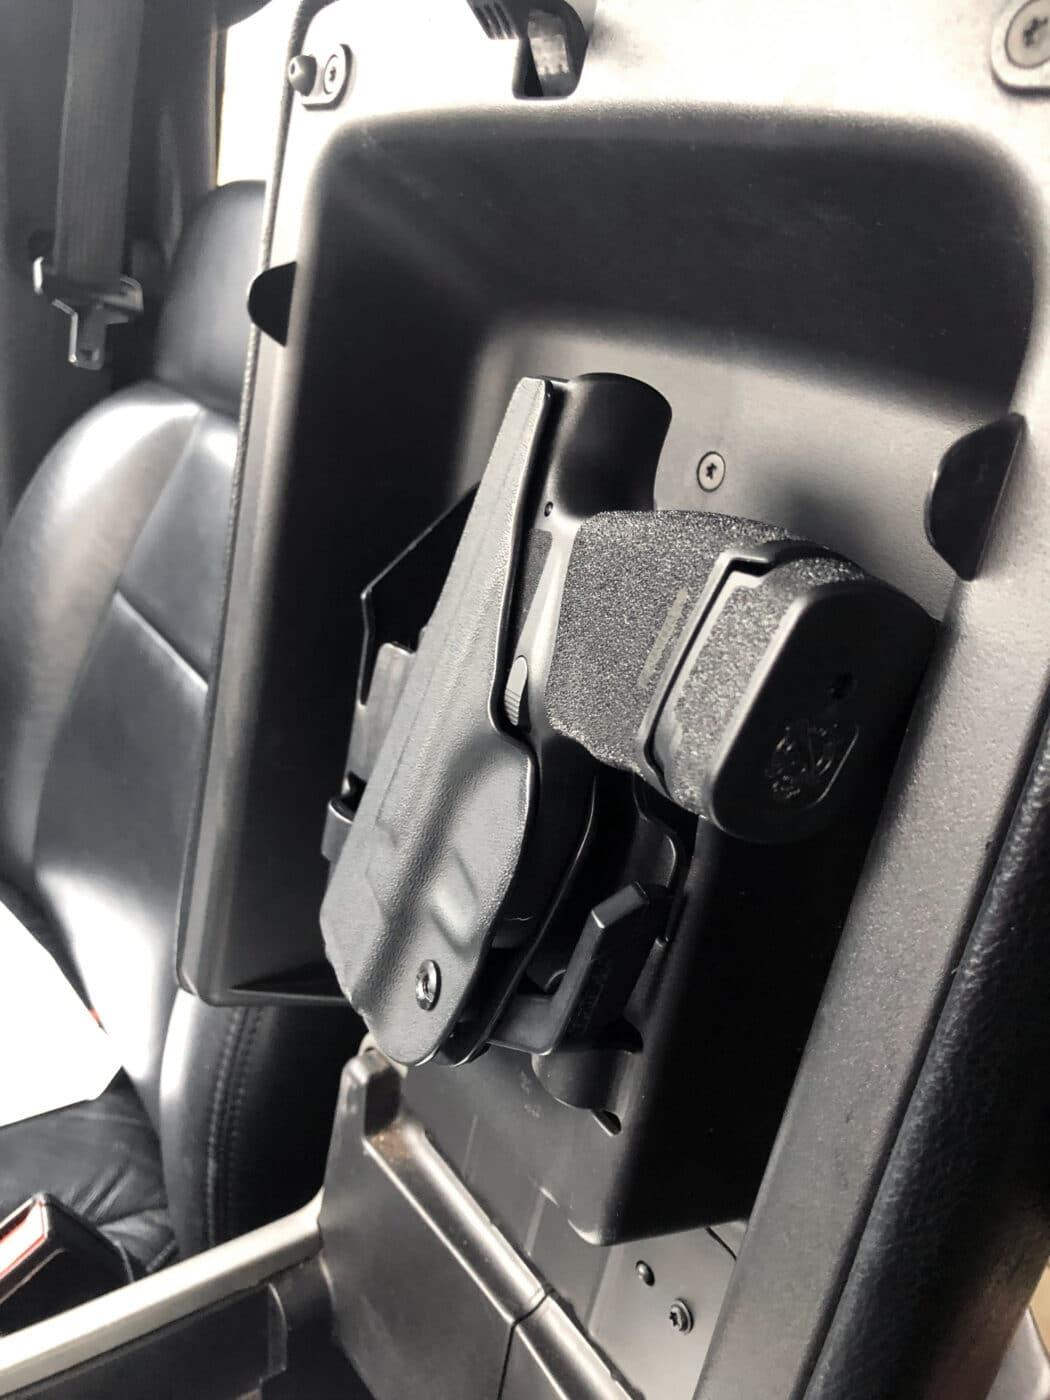 Springfield Hellcat pistol in a concealment holster inside a truck